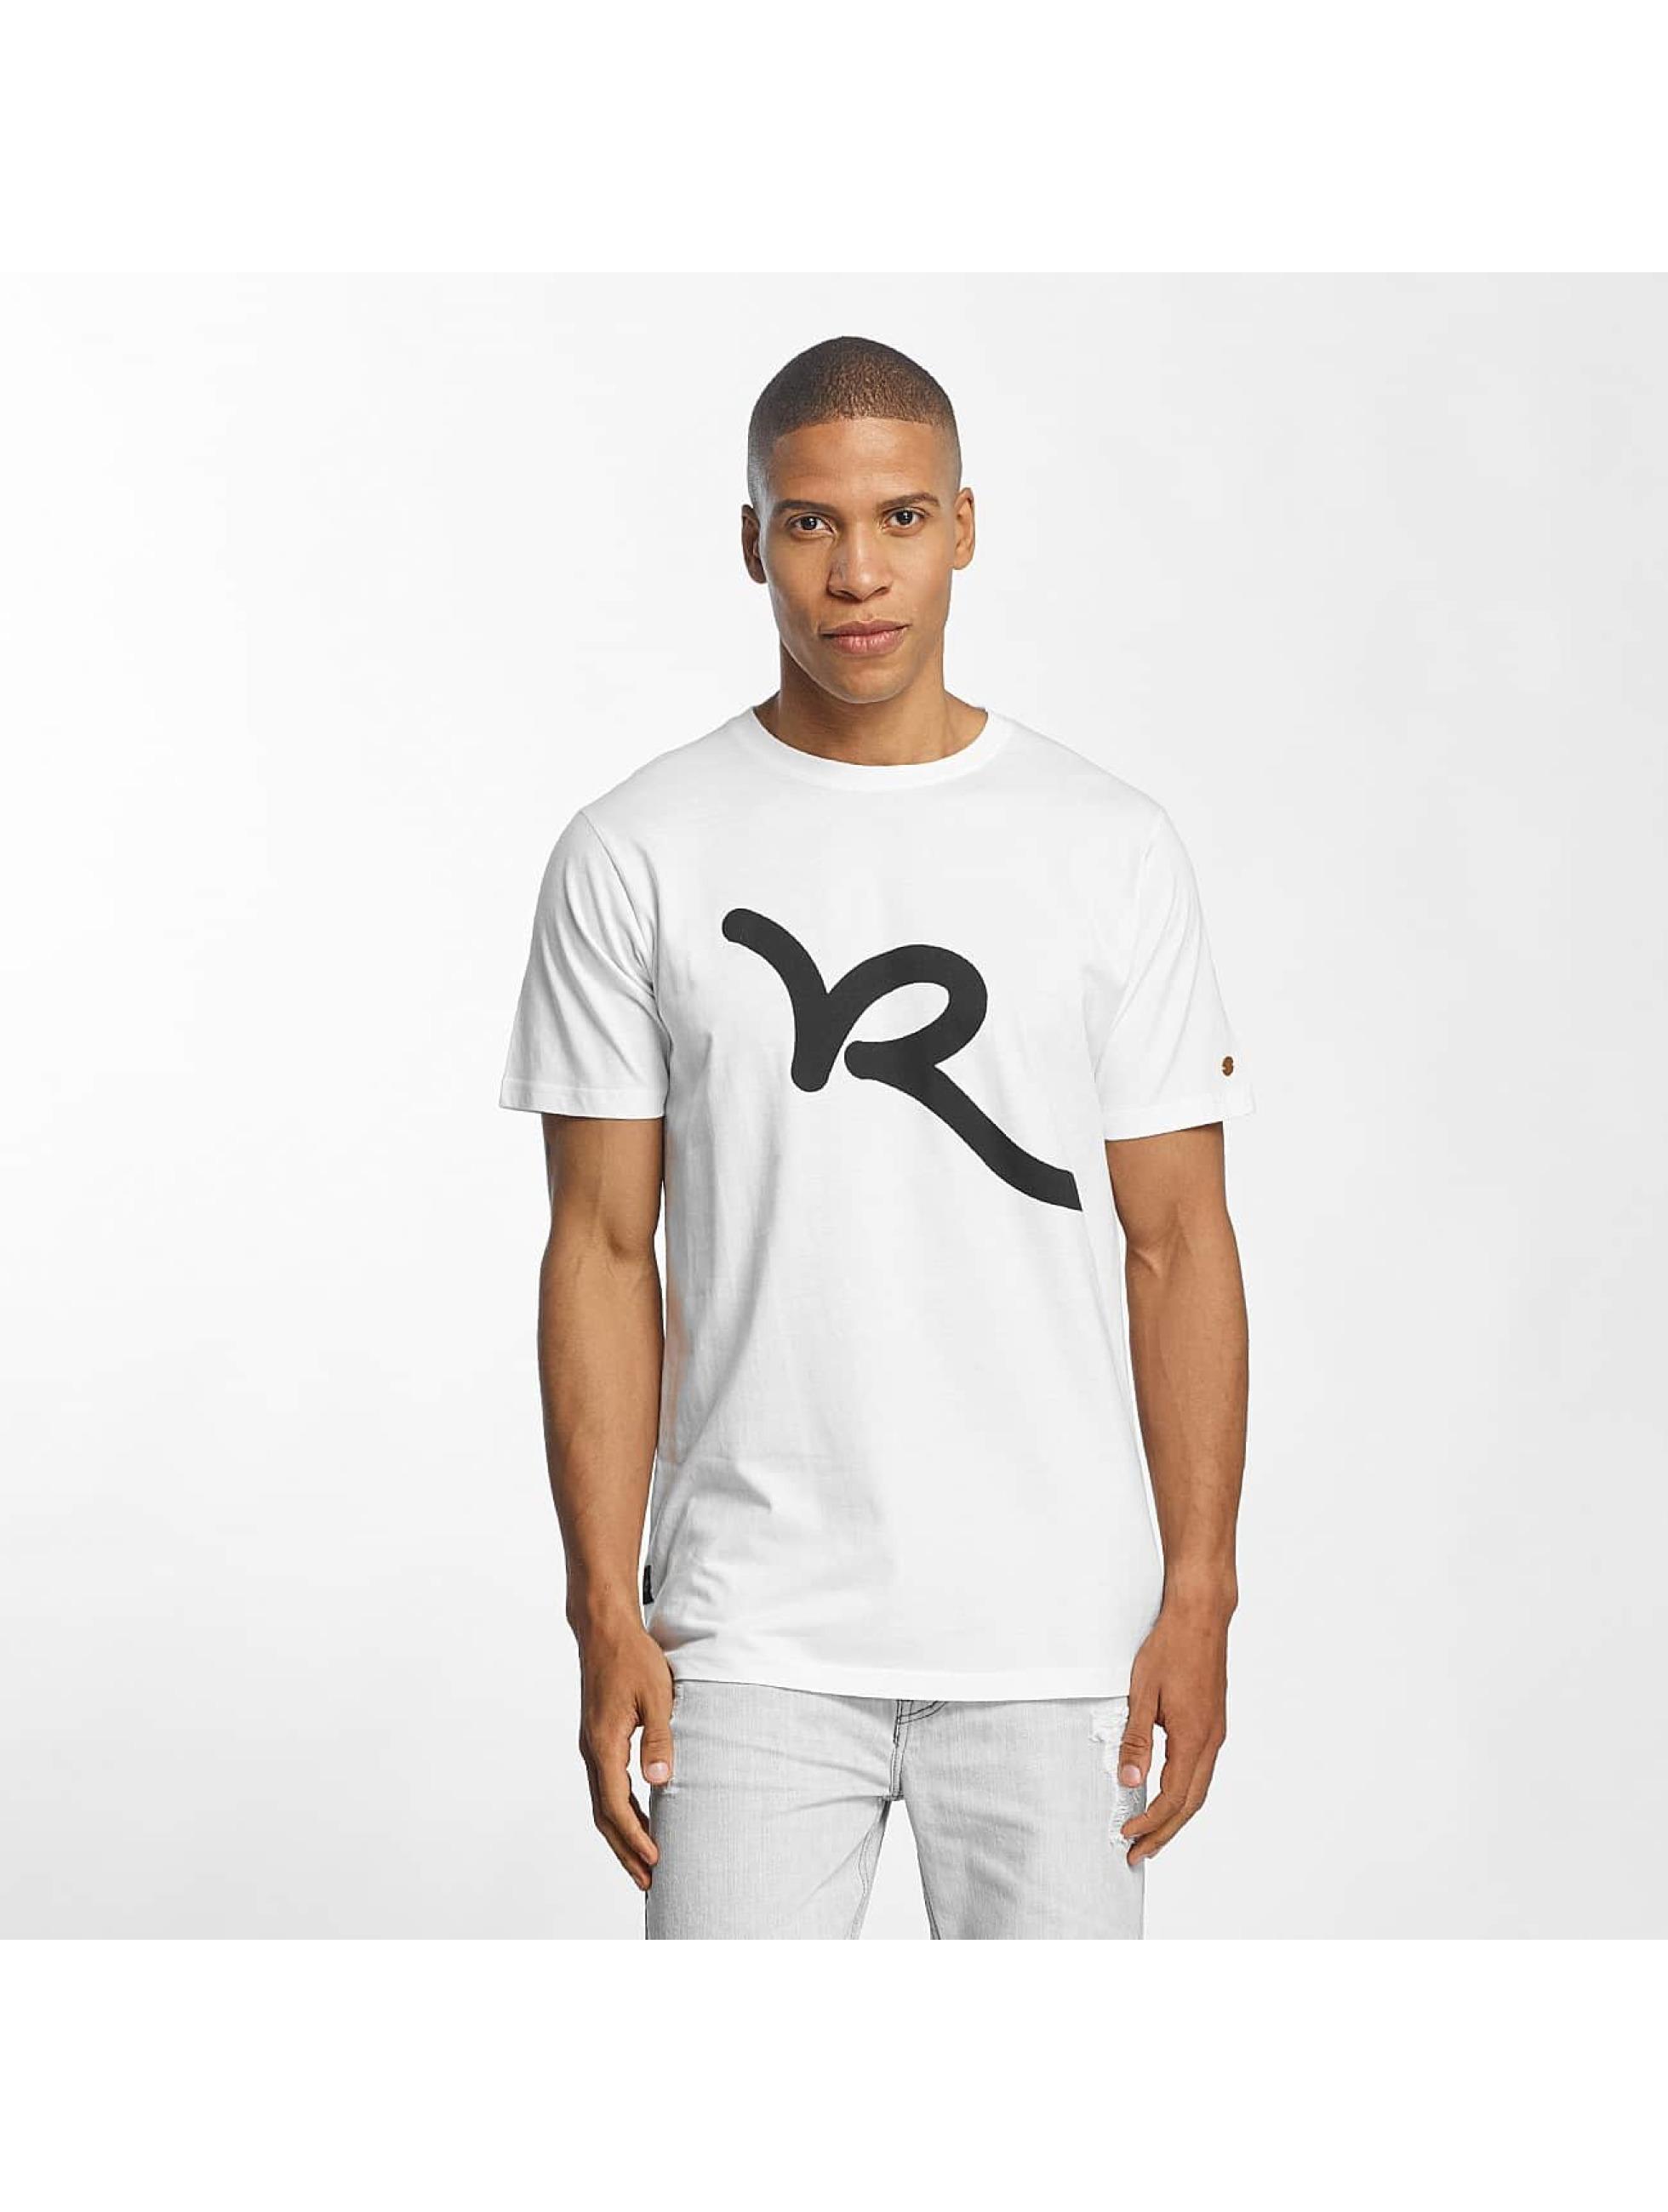 Rocawear / T-Shirt Logo in white XL